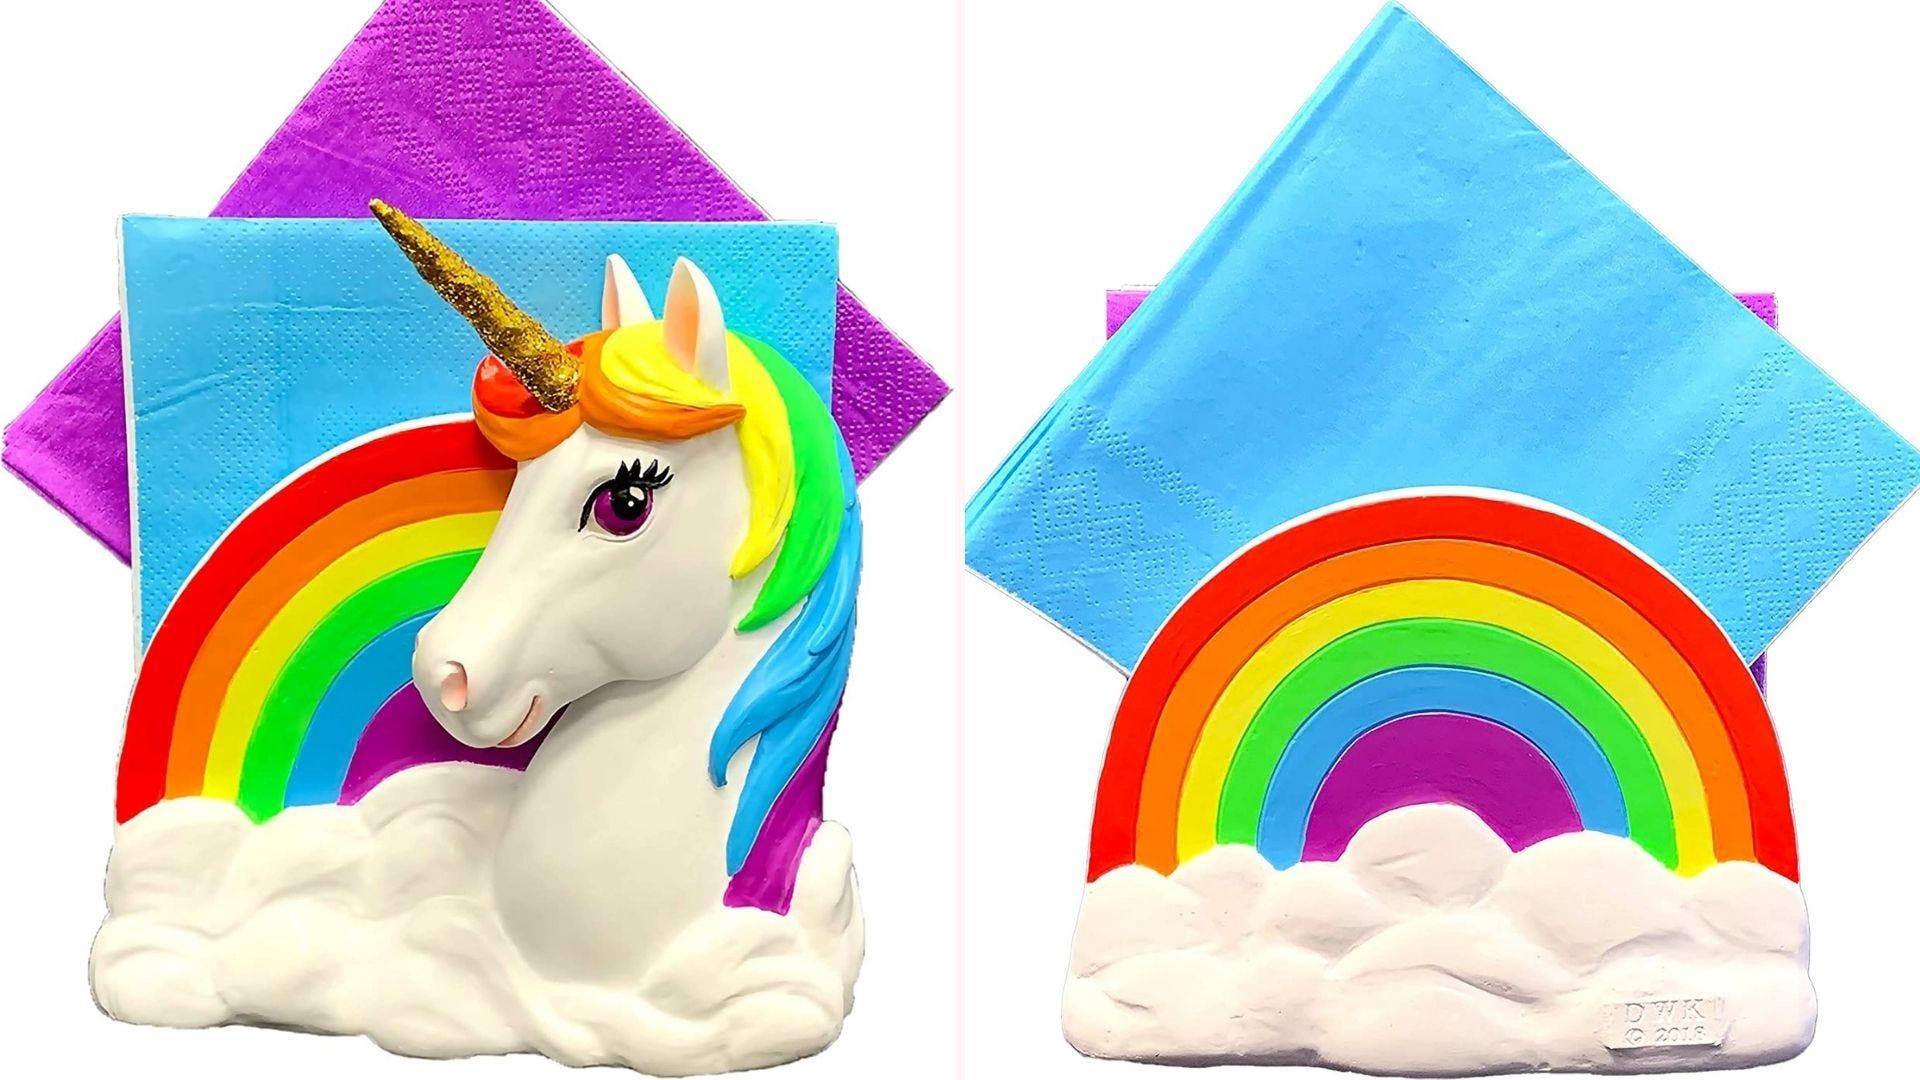 Unicorn and rainbow napkin holder displayed with colorful napkins.